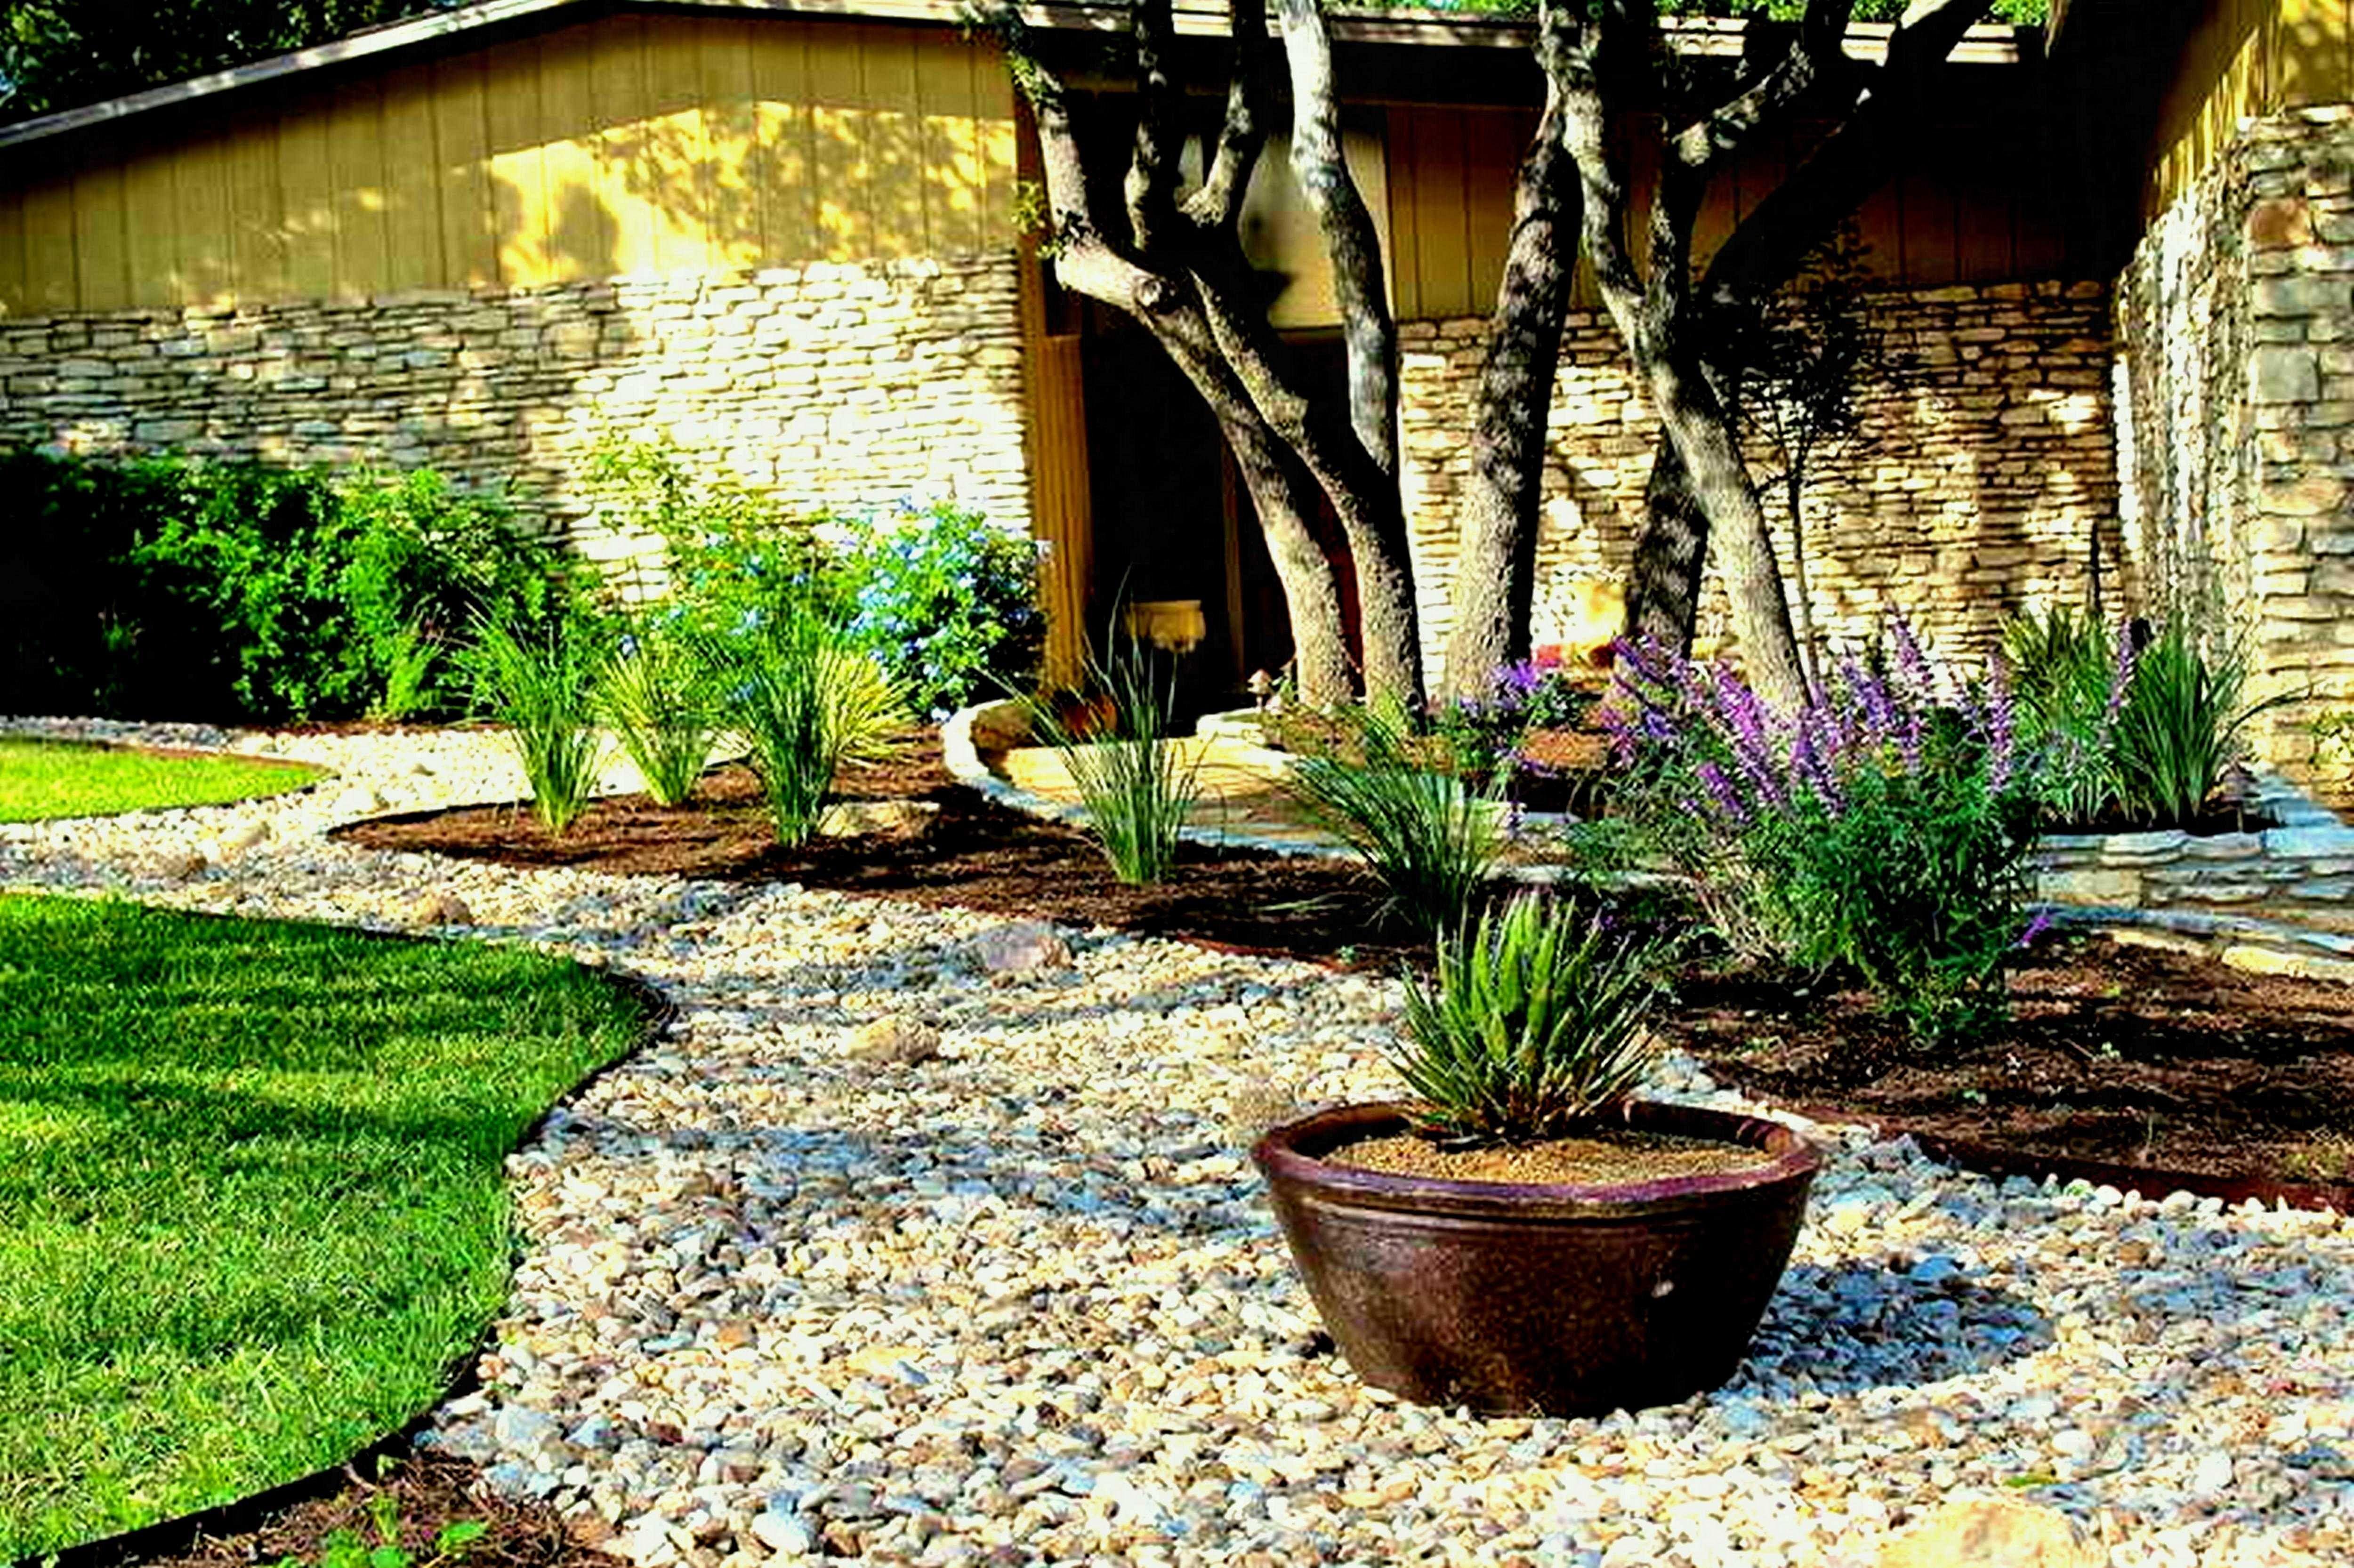 20 Awesome Modern Rock Garden And Flower Decoration Ideas Decor Gardening Ideas Stone Landscaping Small Backyard Gardens Rock Garden Landscaping